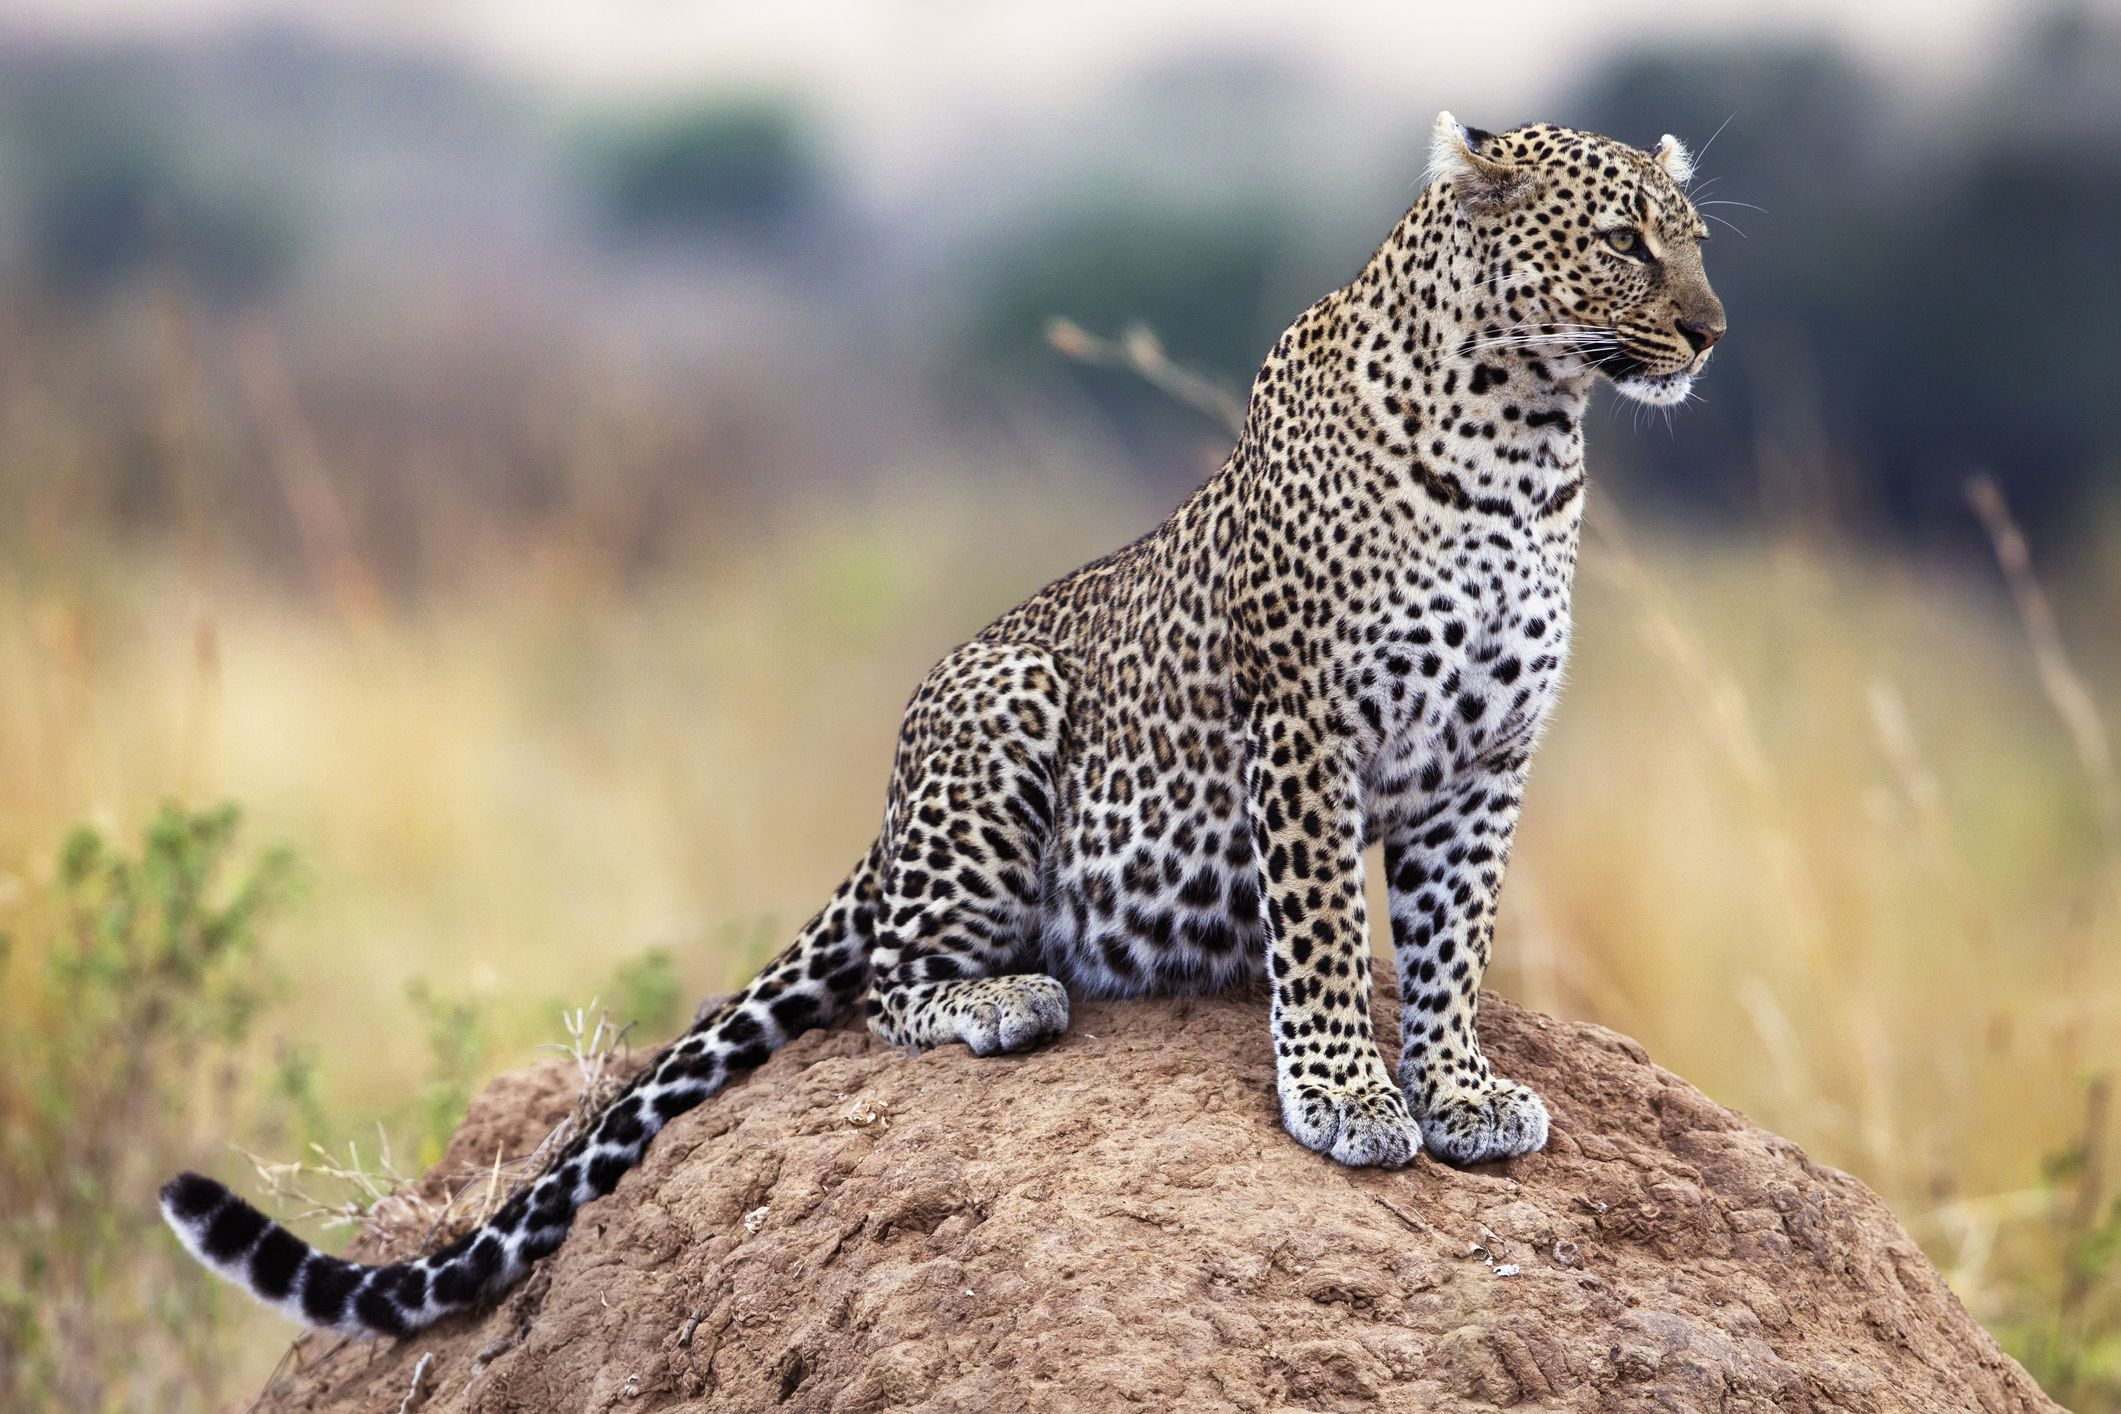 An Introduction to Africa's Big Five Safari Animals